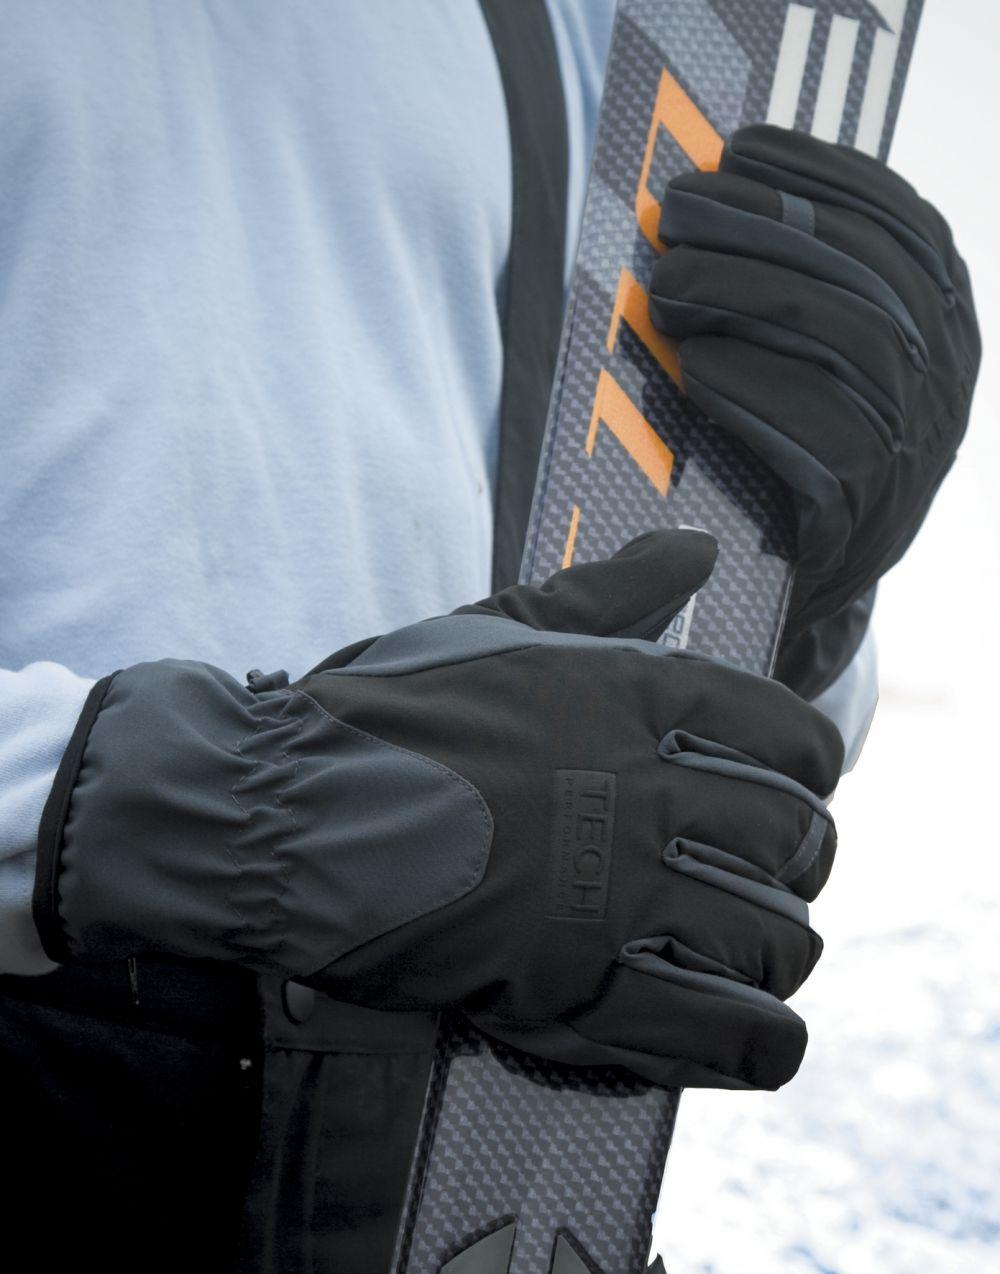 Guantes invierno result guantes softshell performance con logo imagen 1